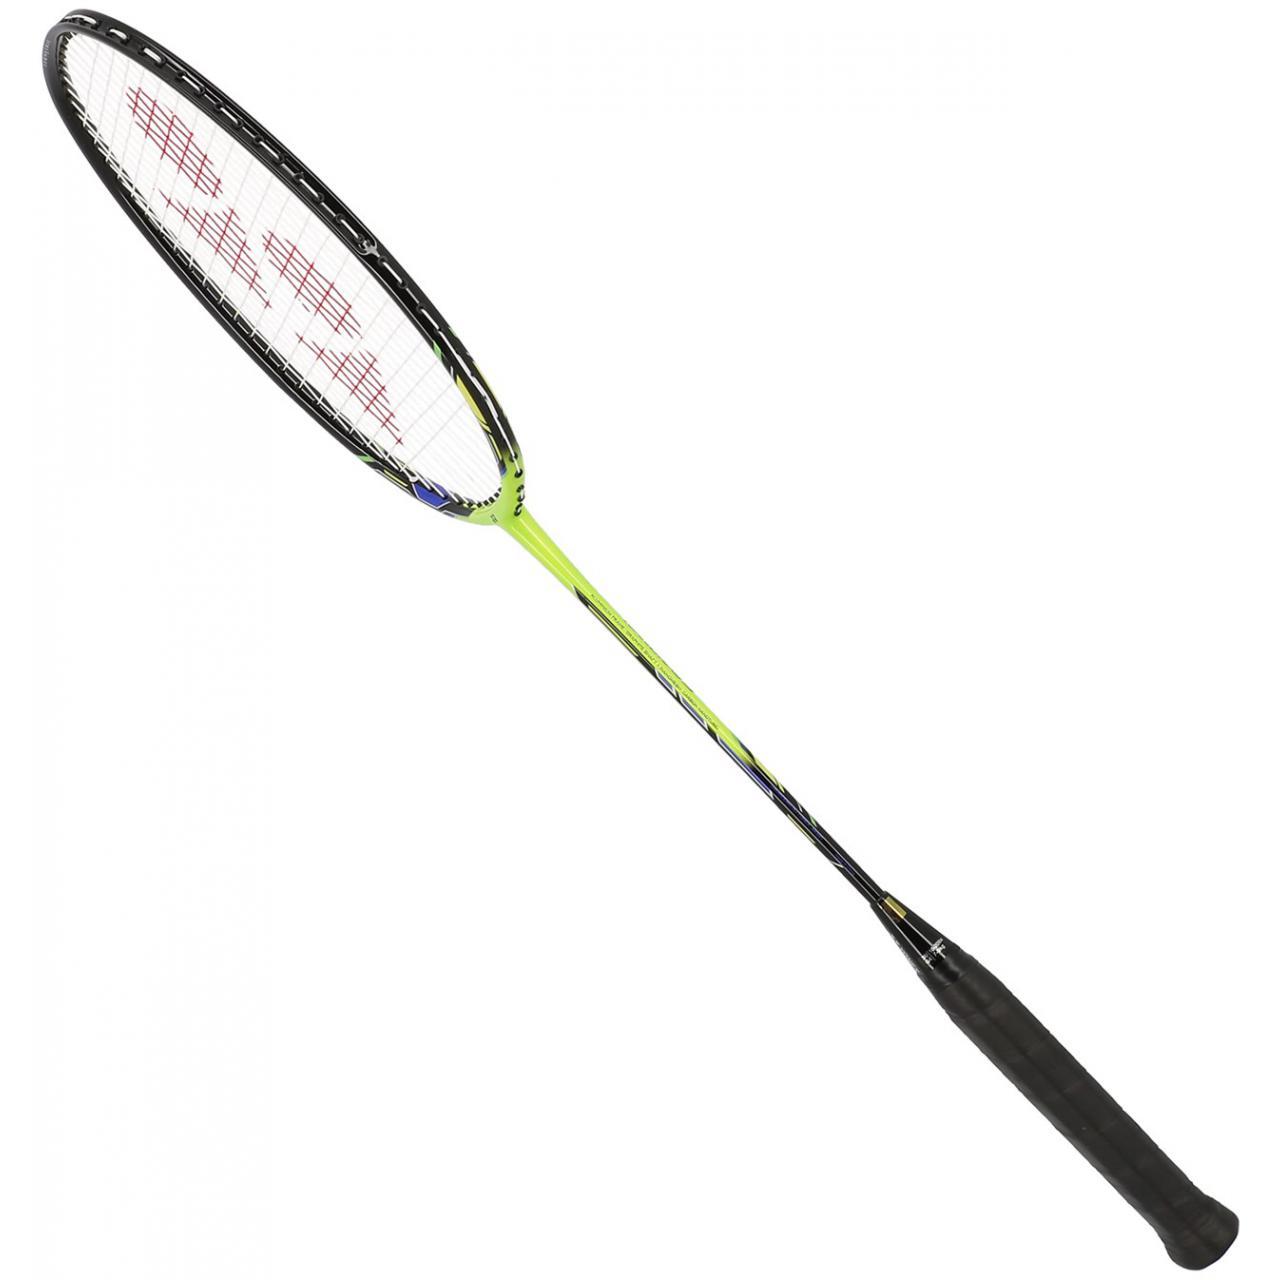 Badminton-Racket-Yonex-Nanoray-3-3u4-Lime-Badminton-Yellow-91913-New thumbnail 2